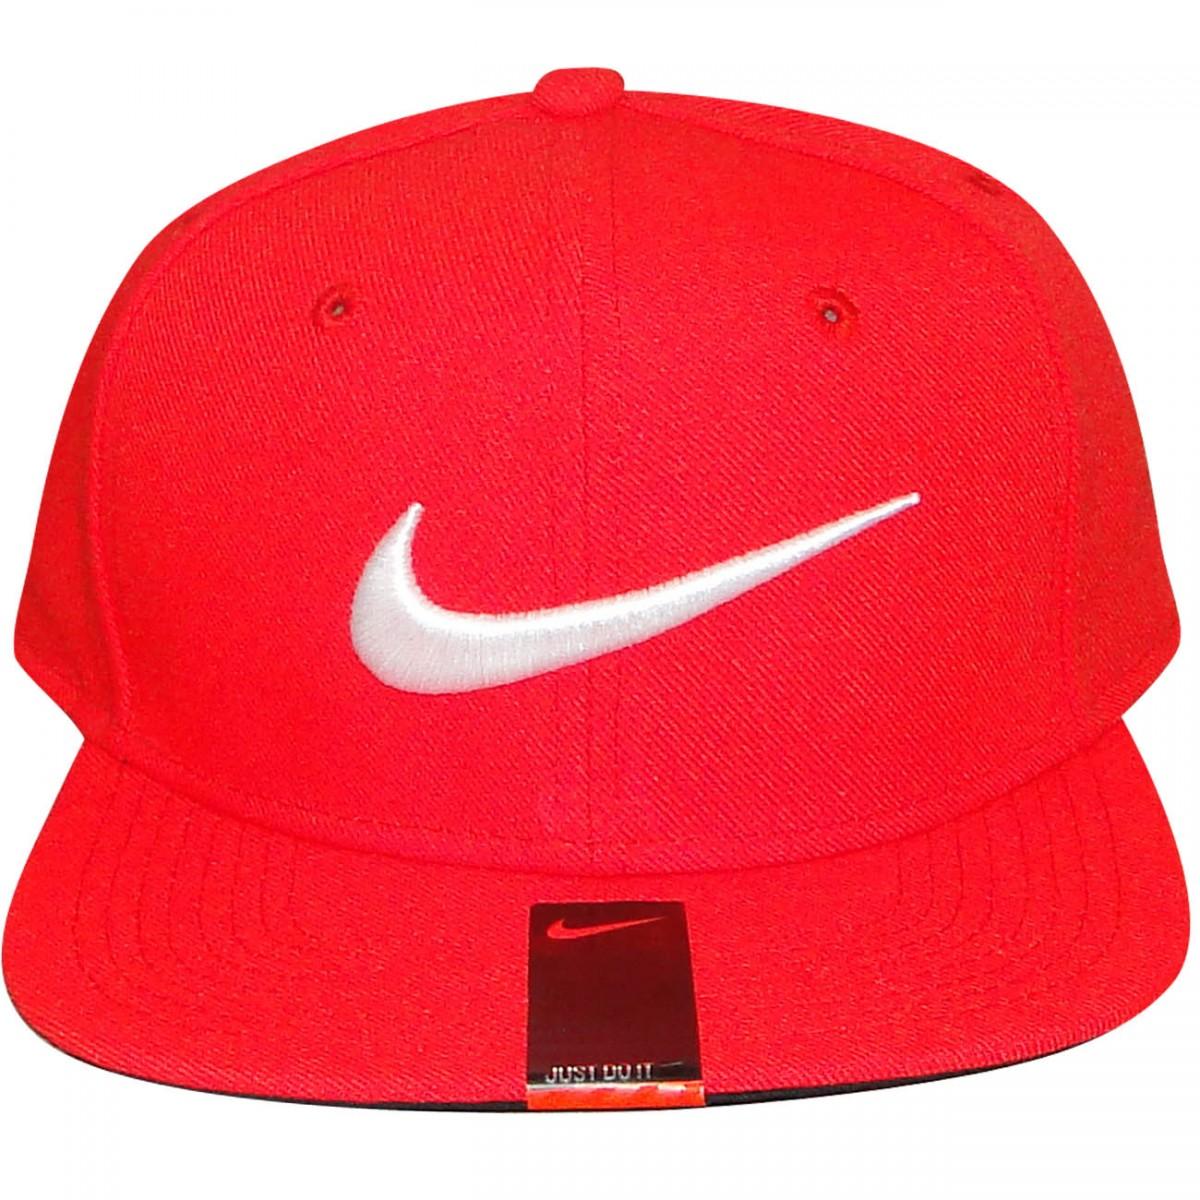 Bone Nike 639534 639534 600 - Vermelho Branco - Chuteira Nike ... 6482607c35dff